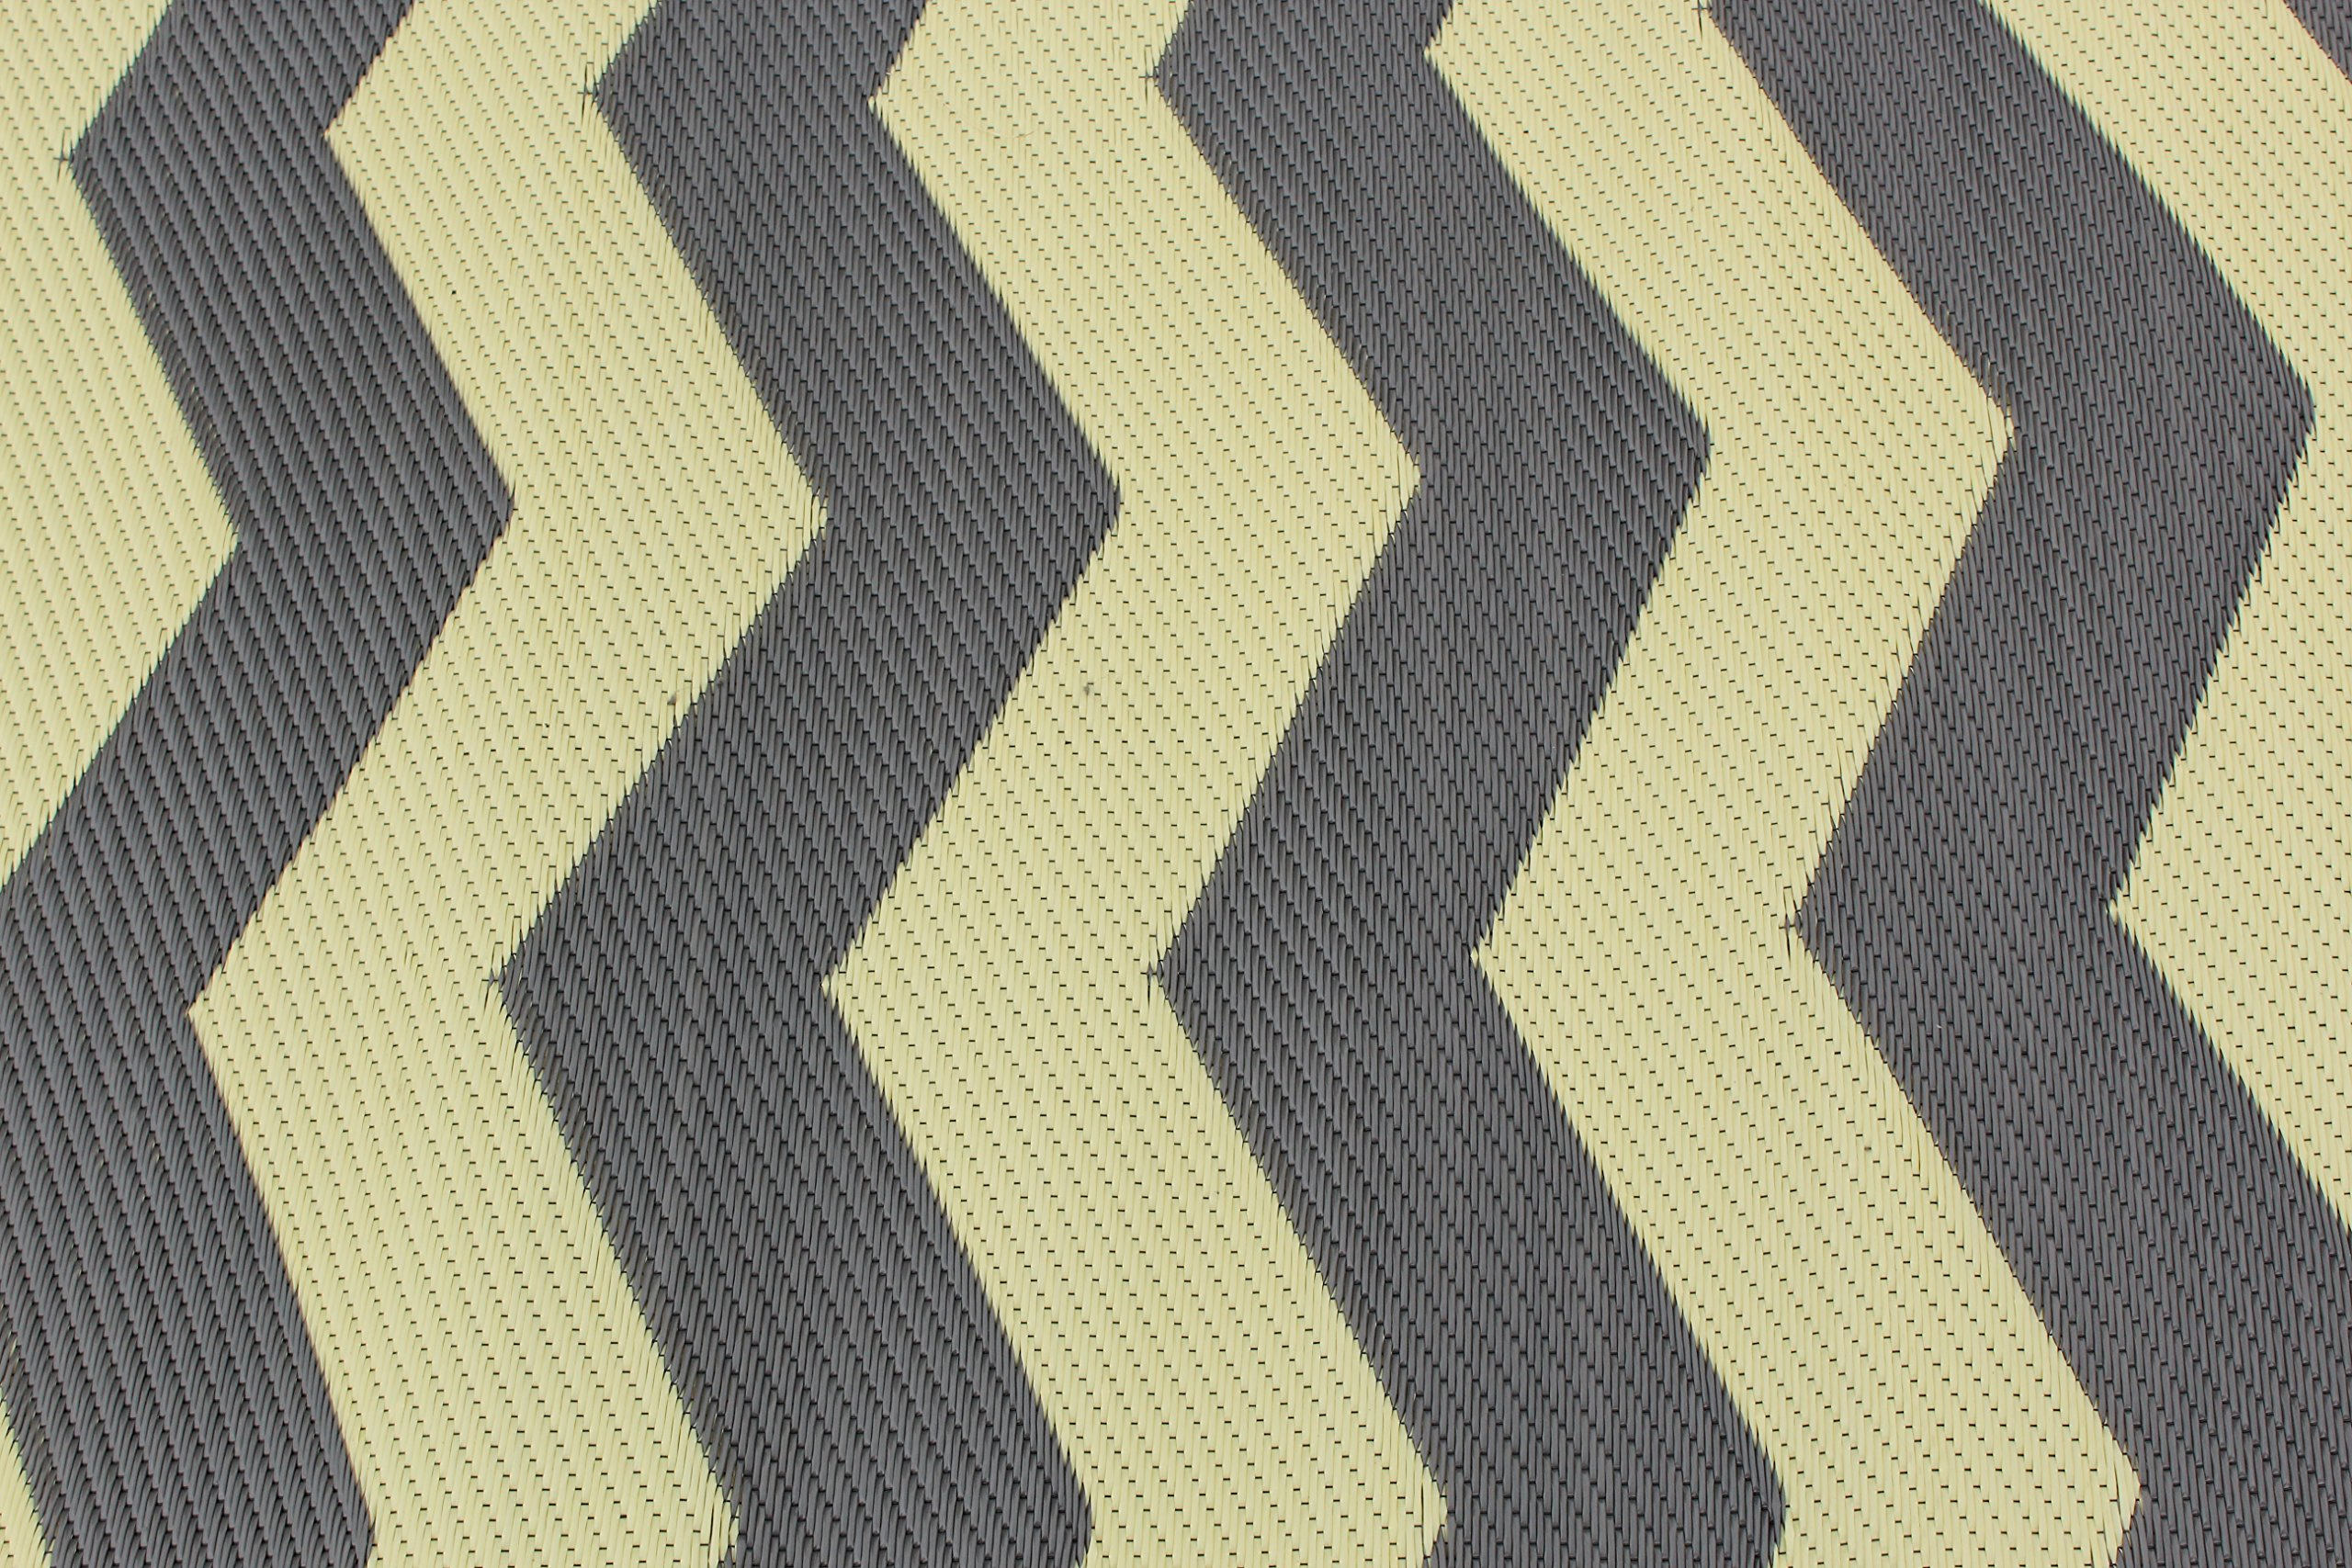 Rv Mat Patio Rug Chevron Pattern 9x16 Tan Charcoal